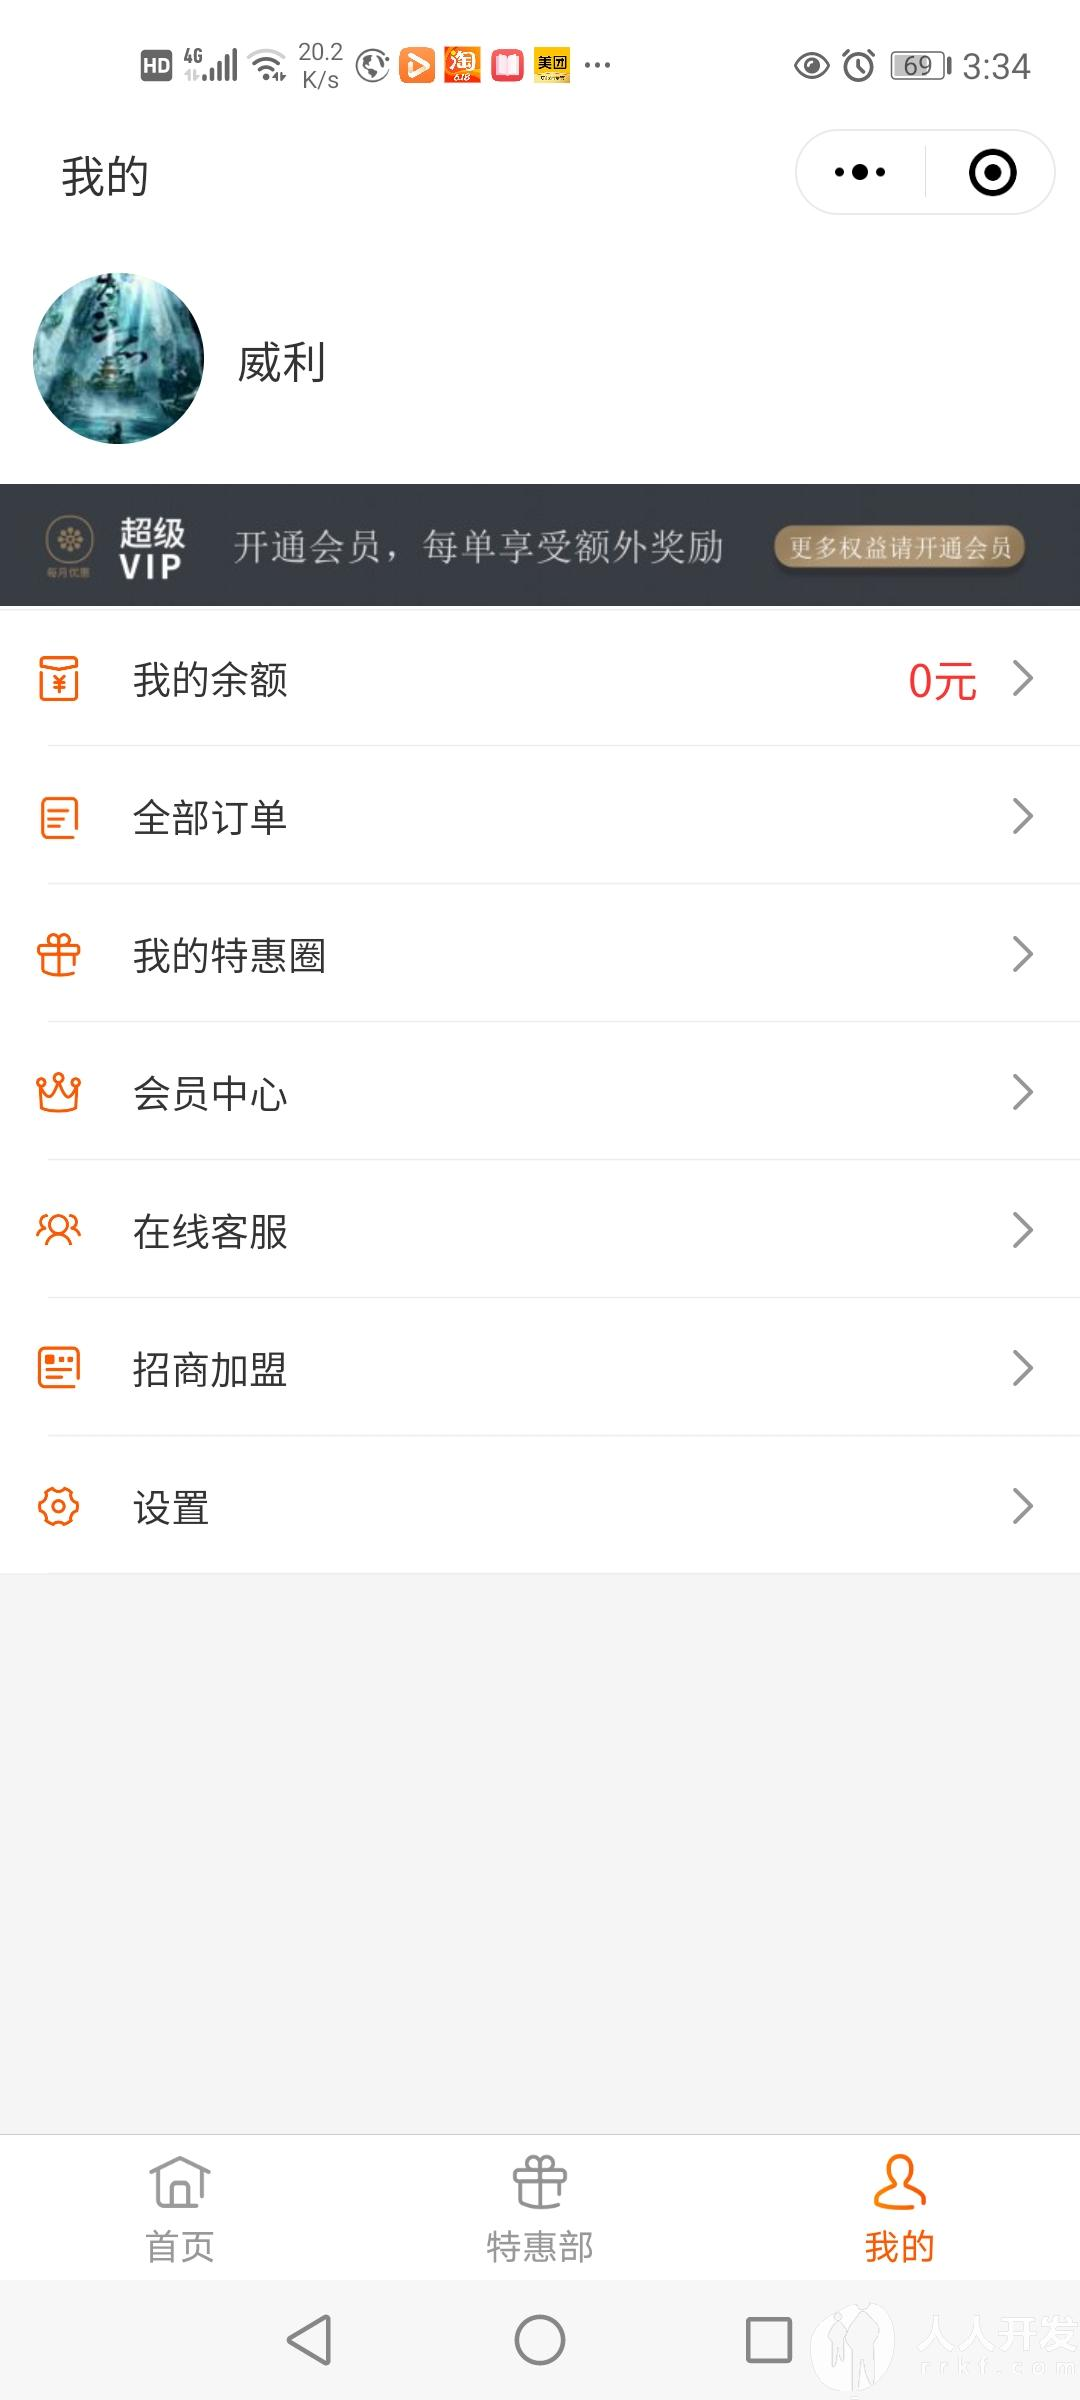 Screenshot_20200714_153443_com.tencent.mm.jpg